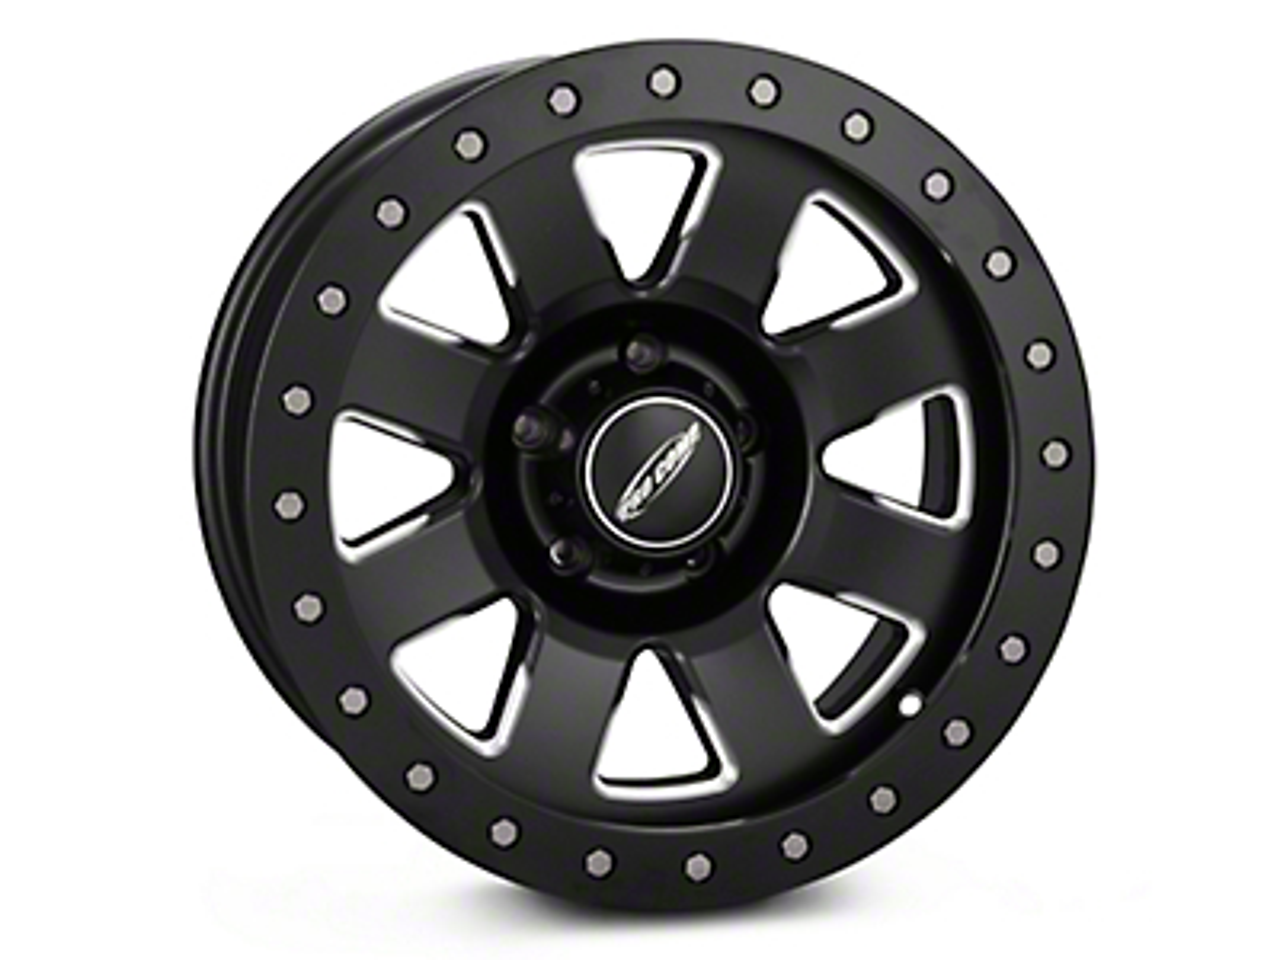 Pro Comp Alloy Series 84 Vapro Pro Satin Black Milled Wheel - 17x9 (07-18 Wrangler JK)